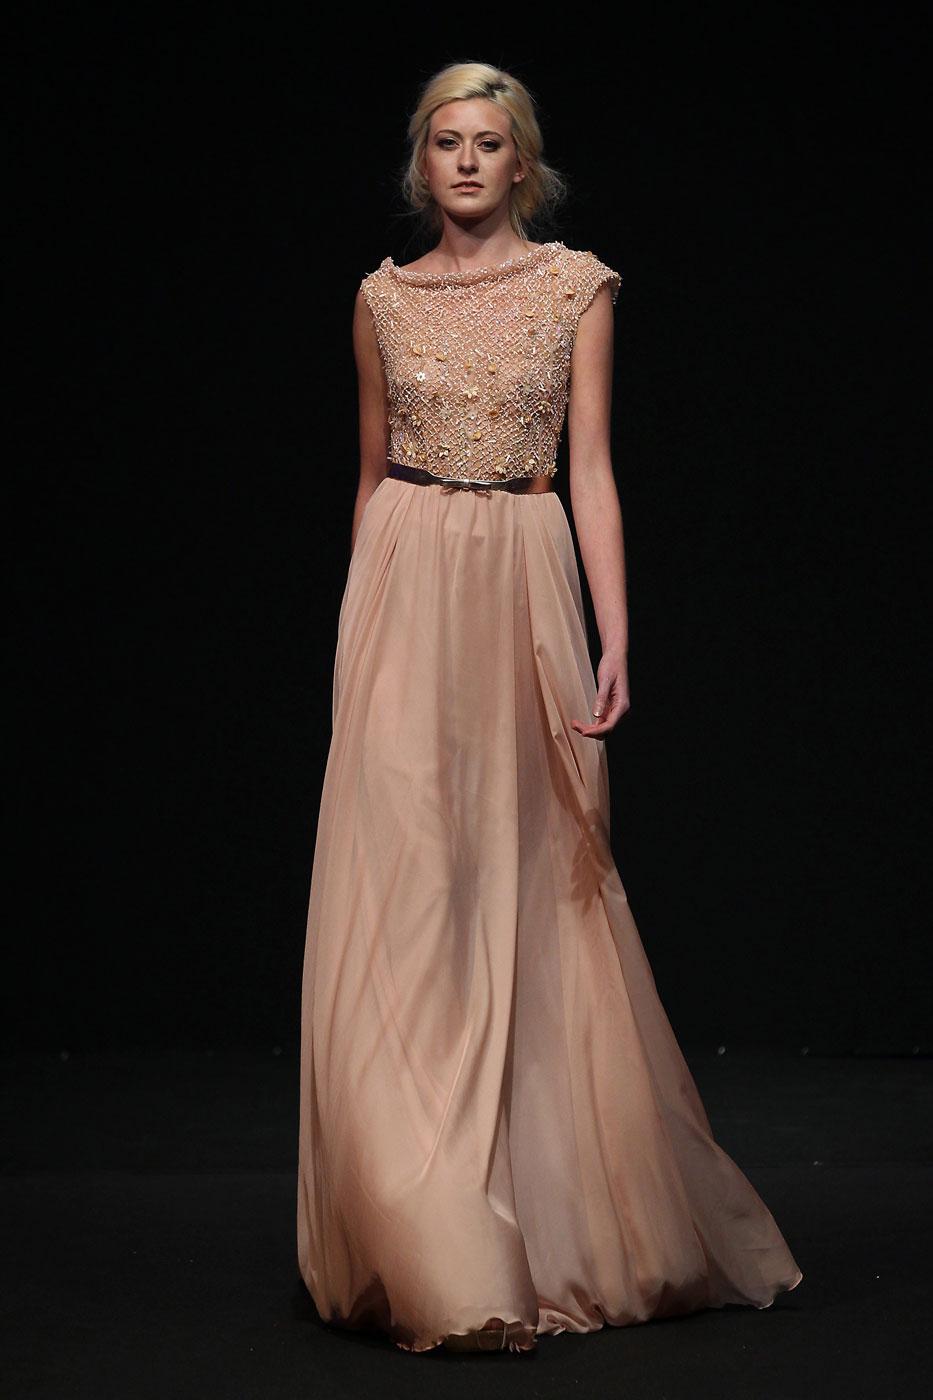 Abed-Mahfouz-fashion-runway-show-haute-couture-paris-spring-2015-the-impression-19